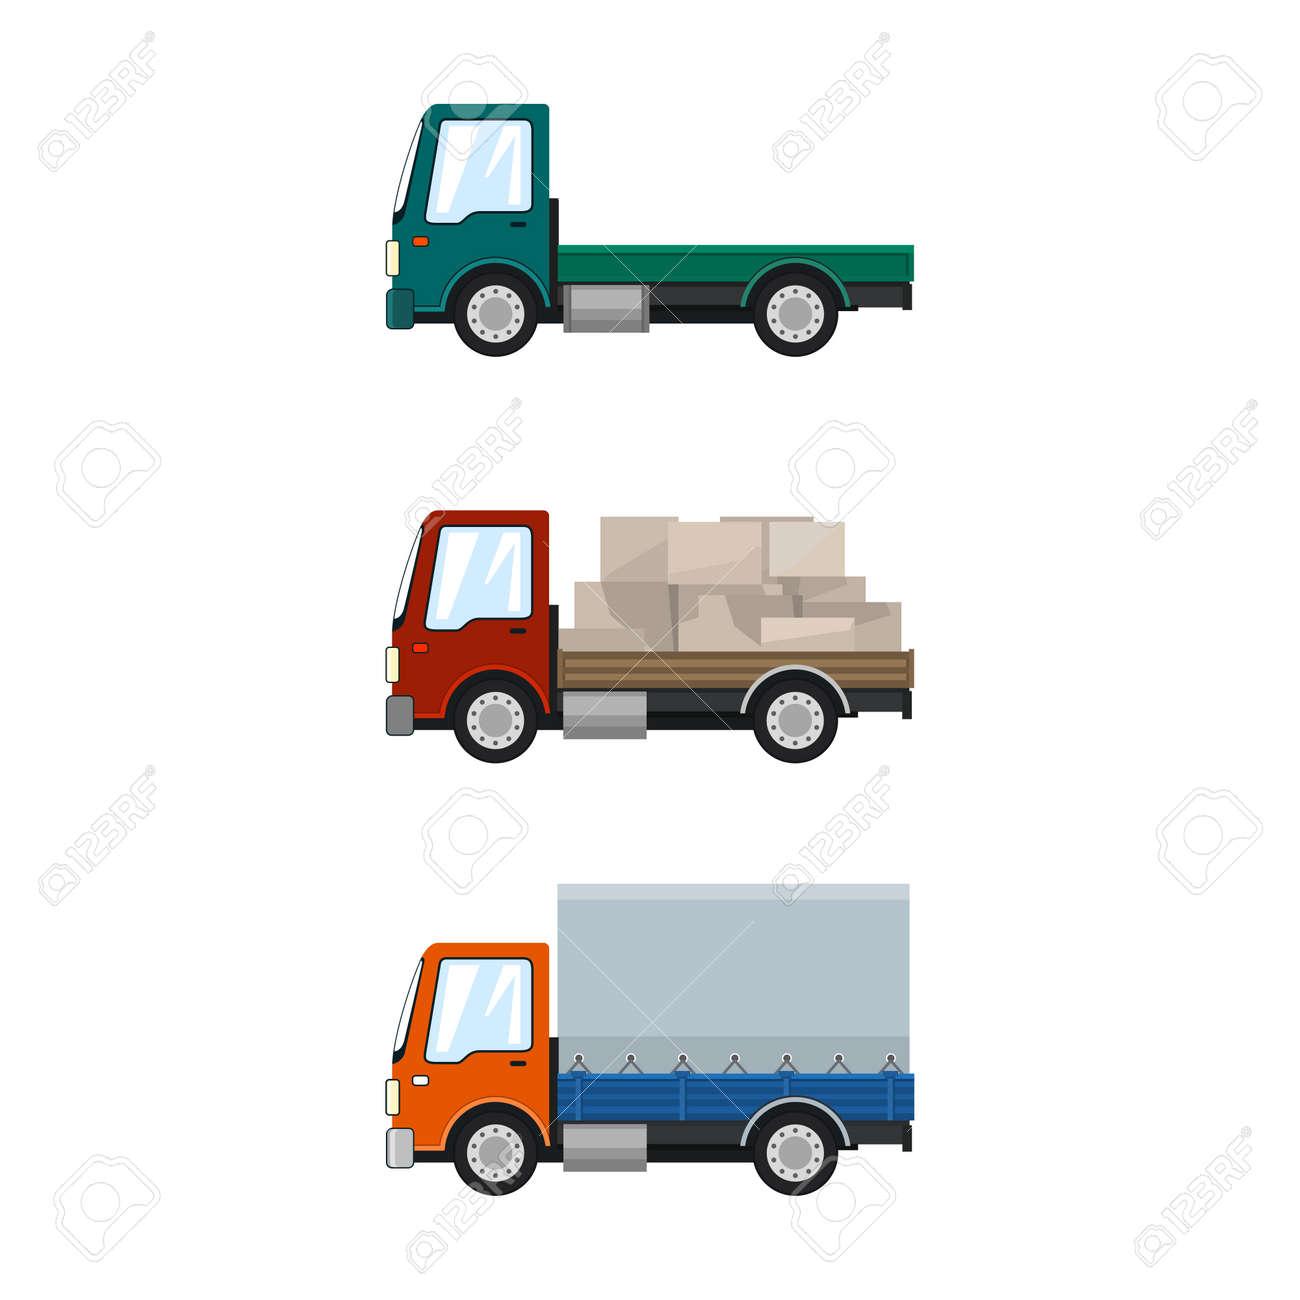 without transportation